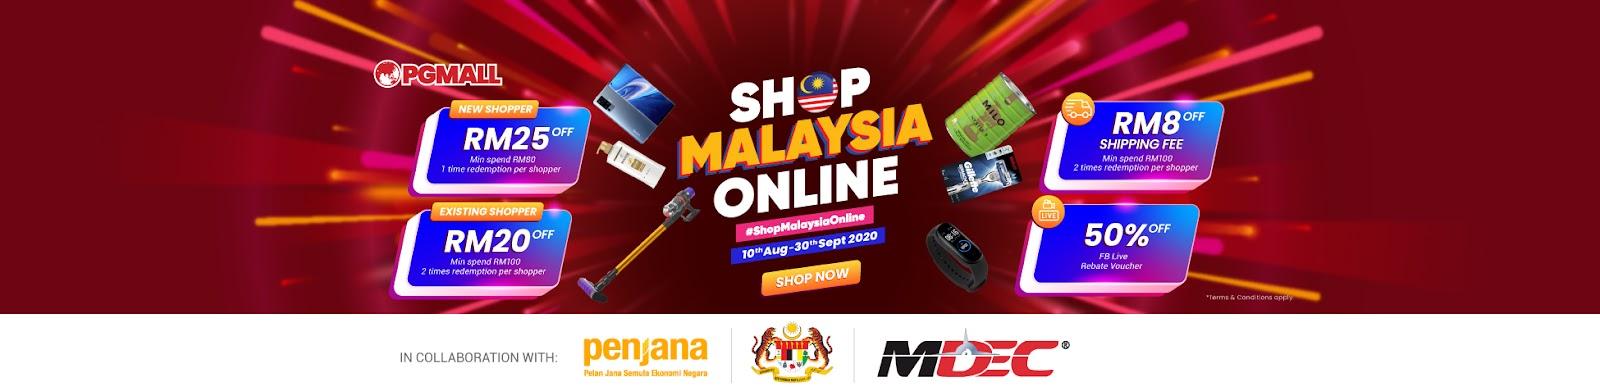 Shop-Malaysia-Online_-1950x477px_Website-Slider